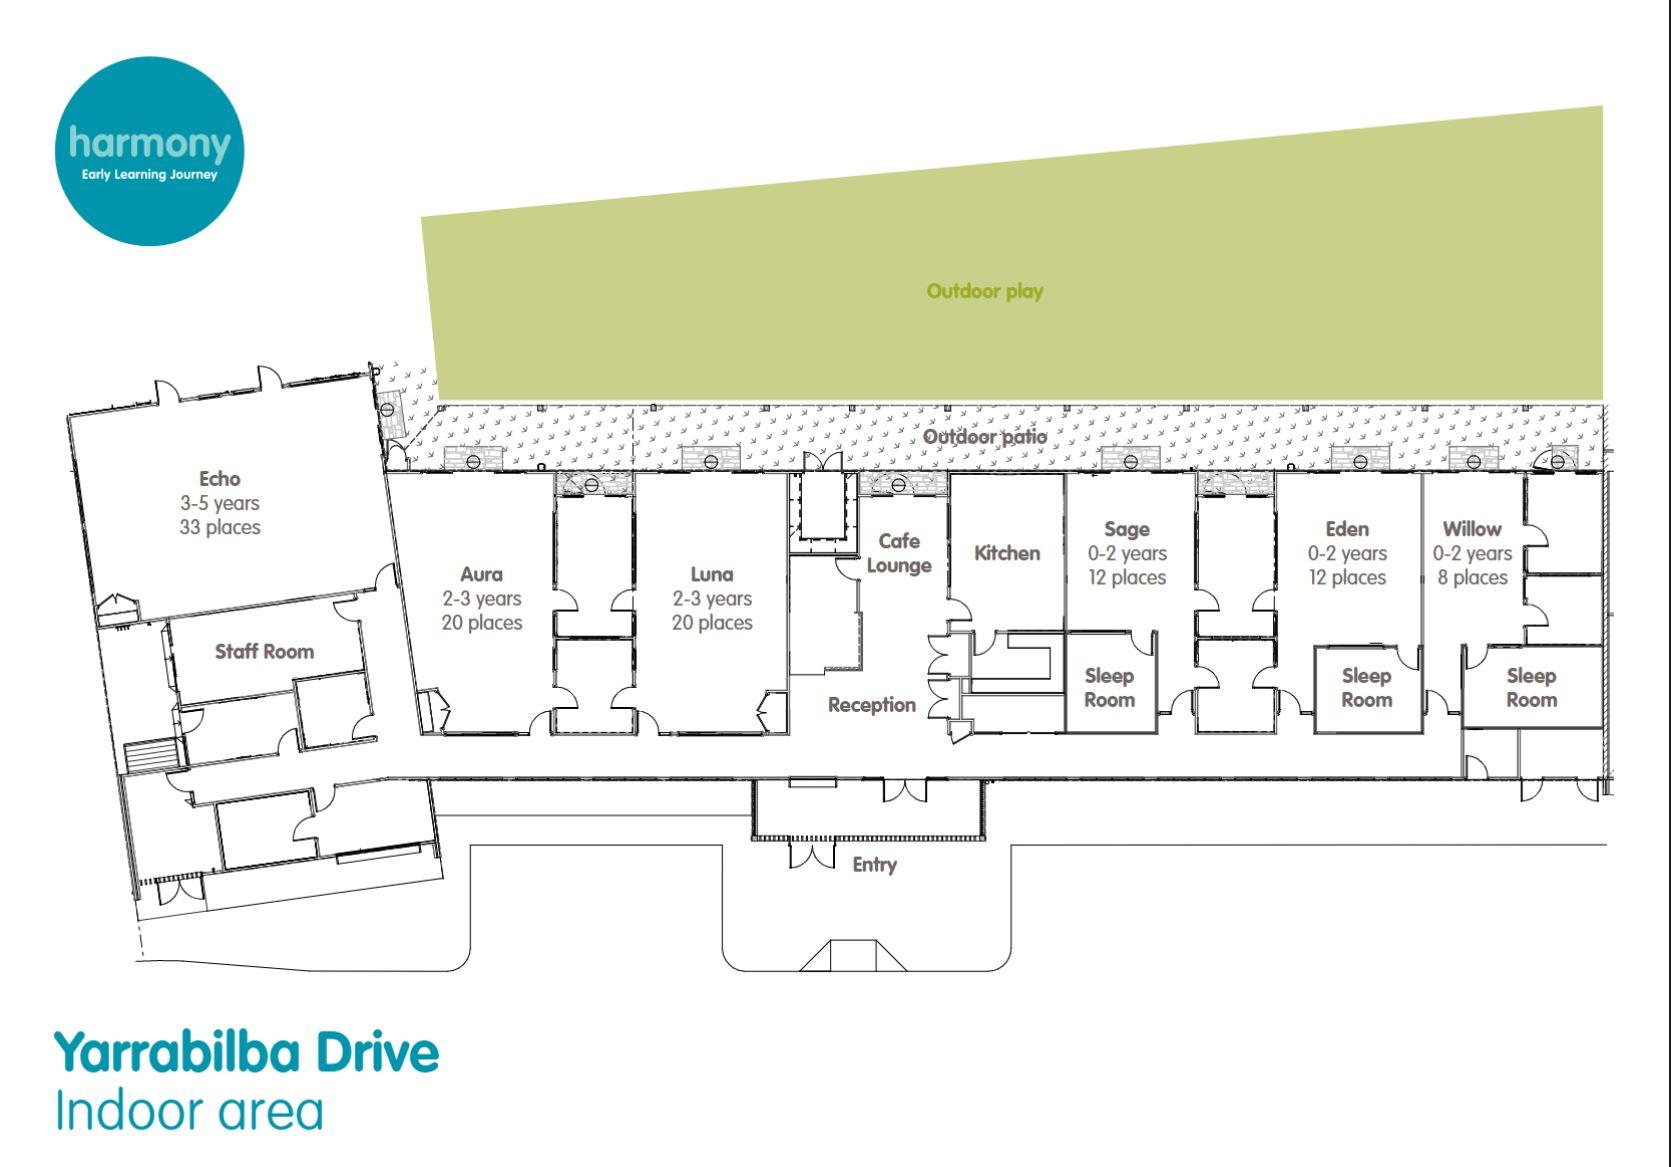 Yarrabilba Drive Floor Plan